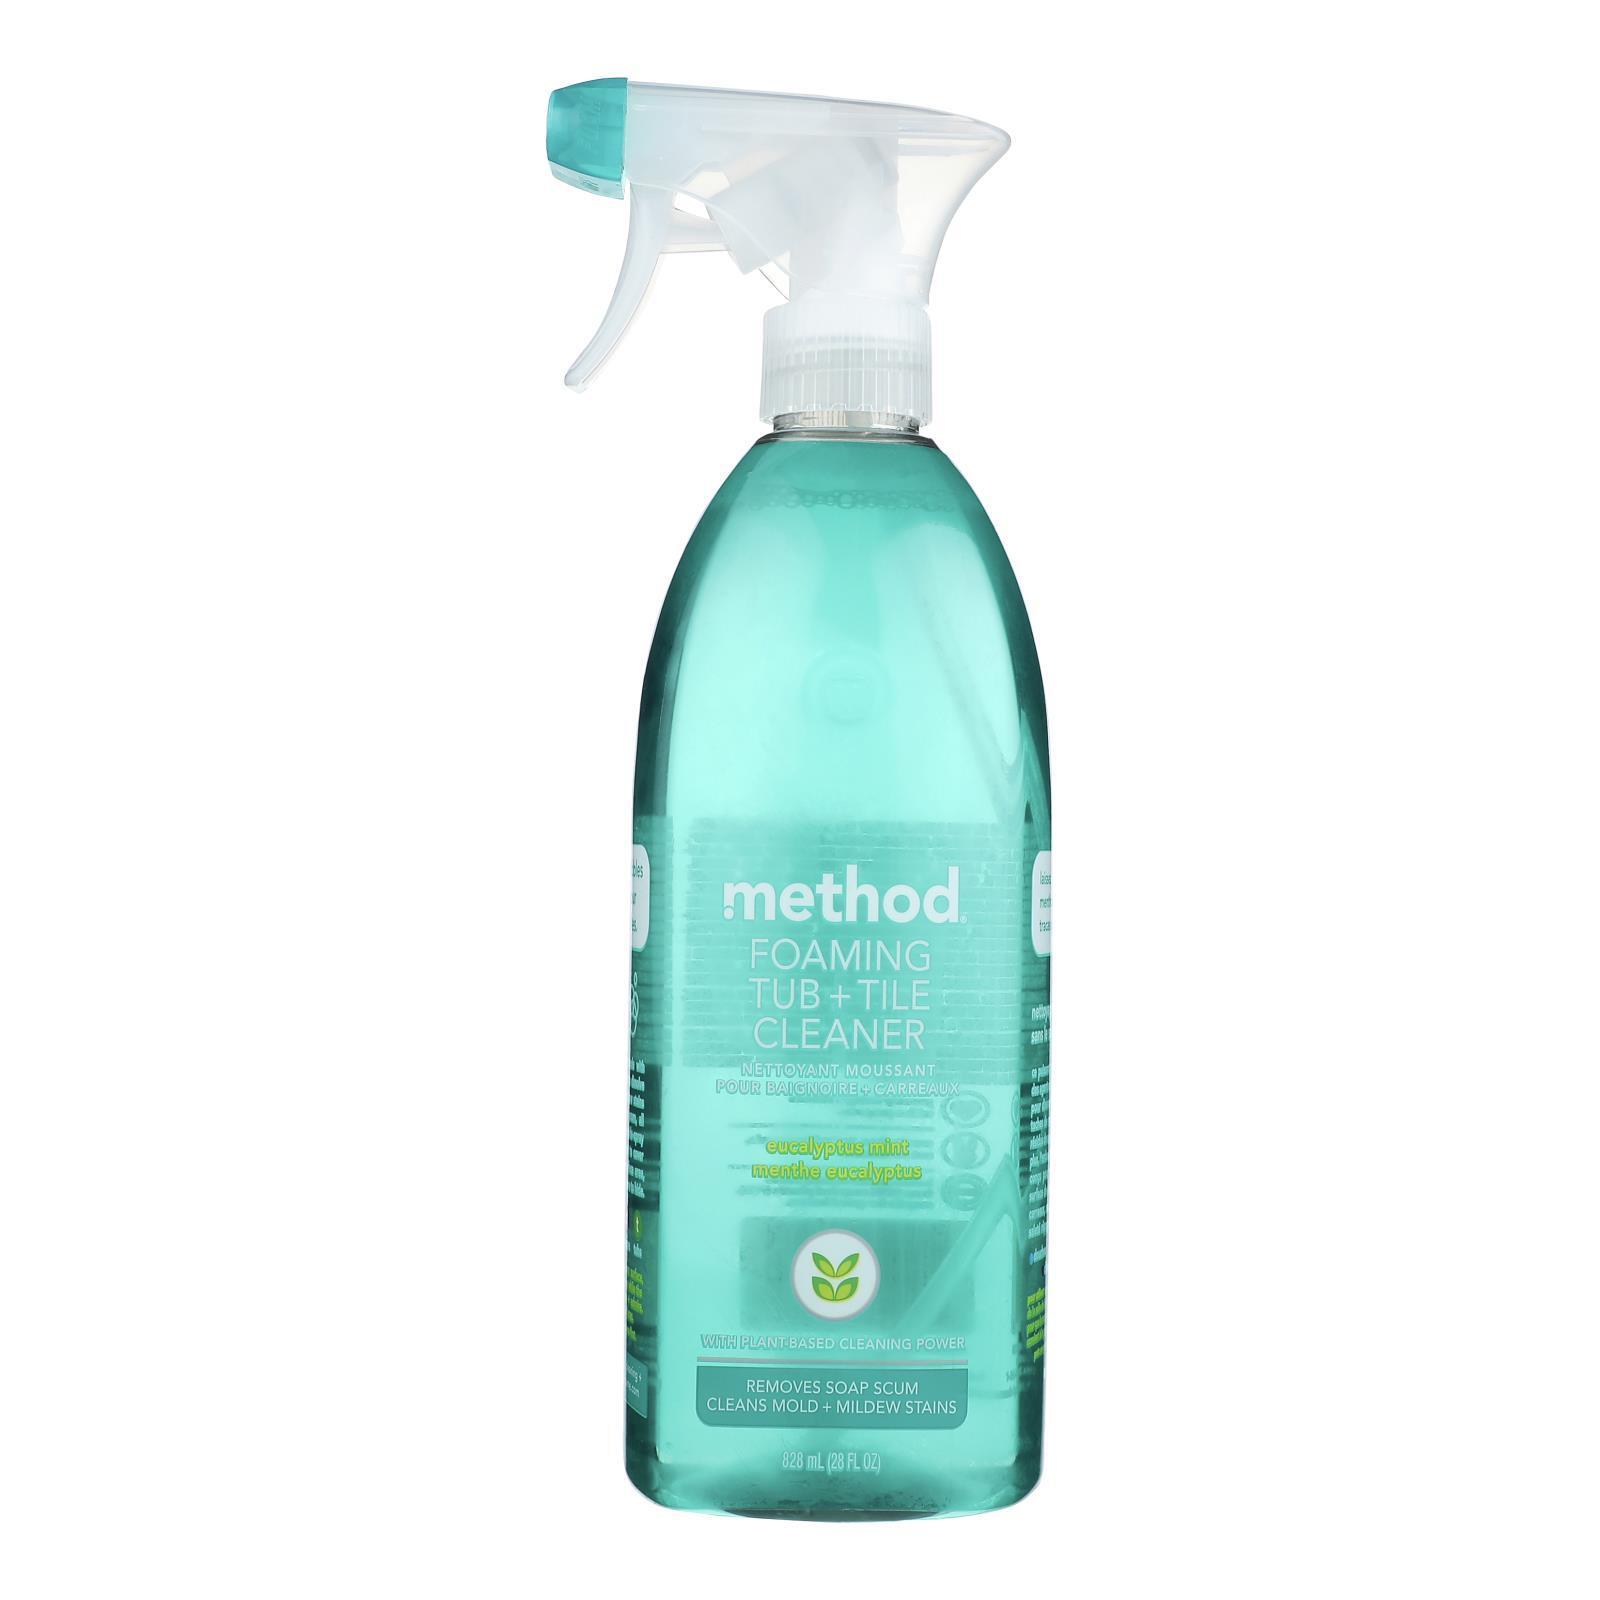 Method Products Inc Foaming Cleaner - Bathroom - Case of 8 - 28 fl oz